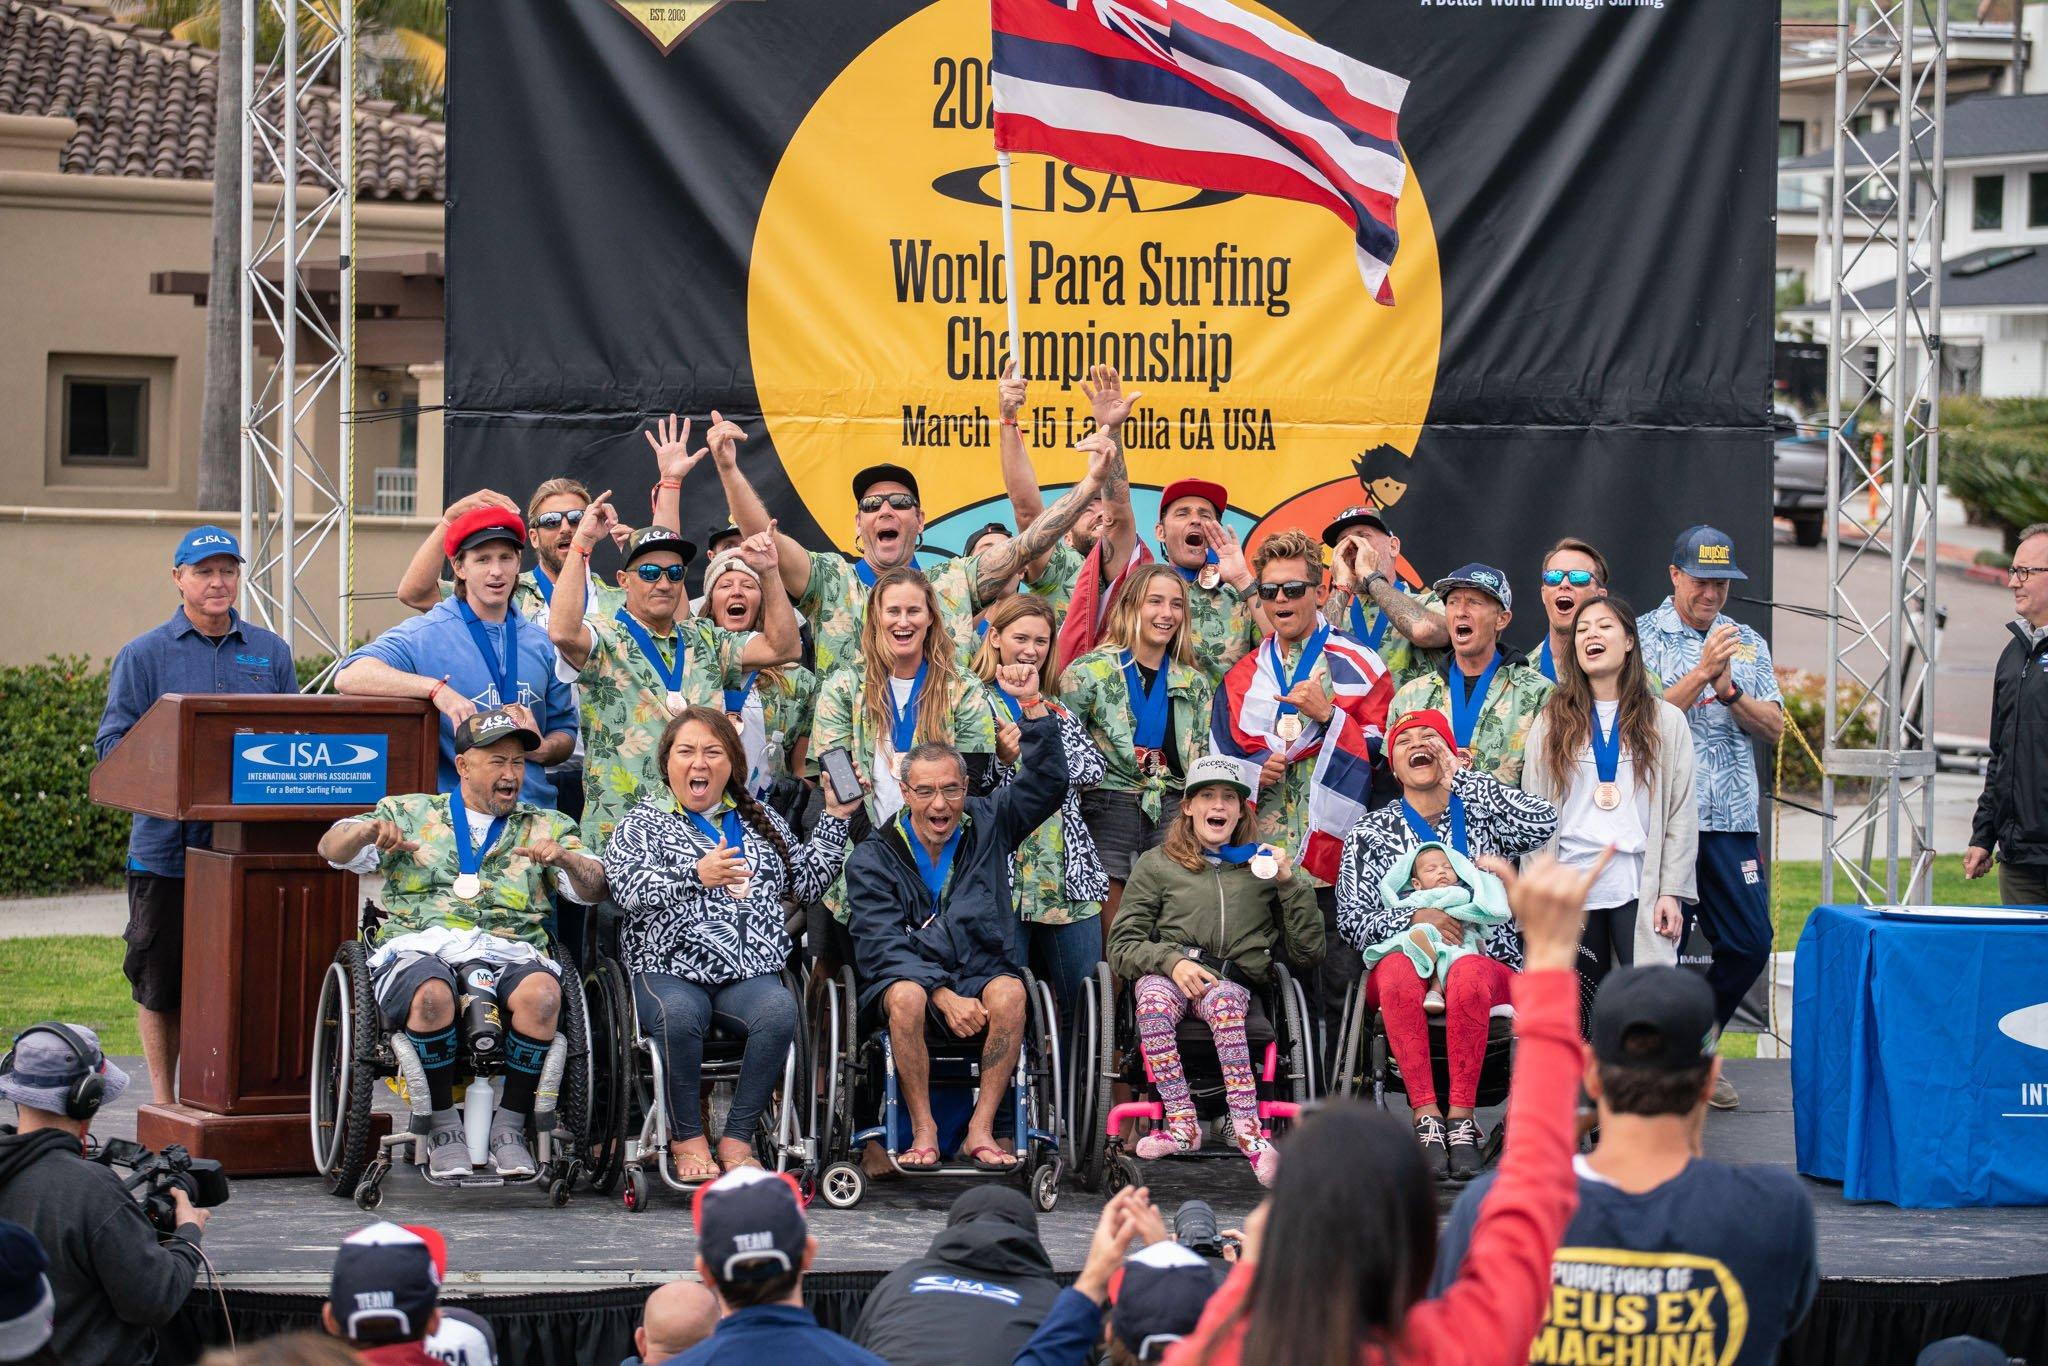 2020 Team Hawaii World Parasurfing Team